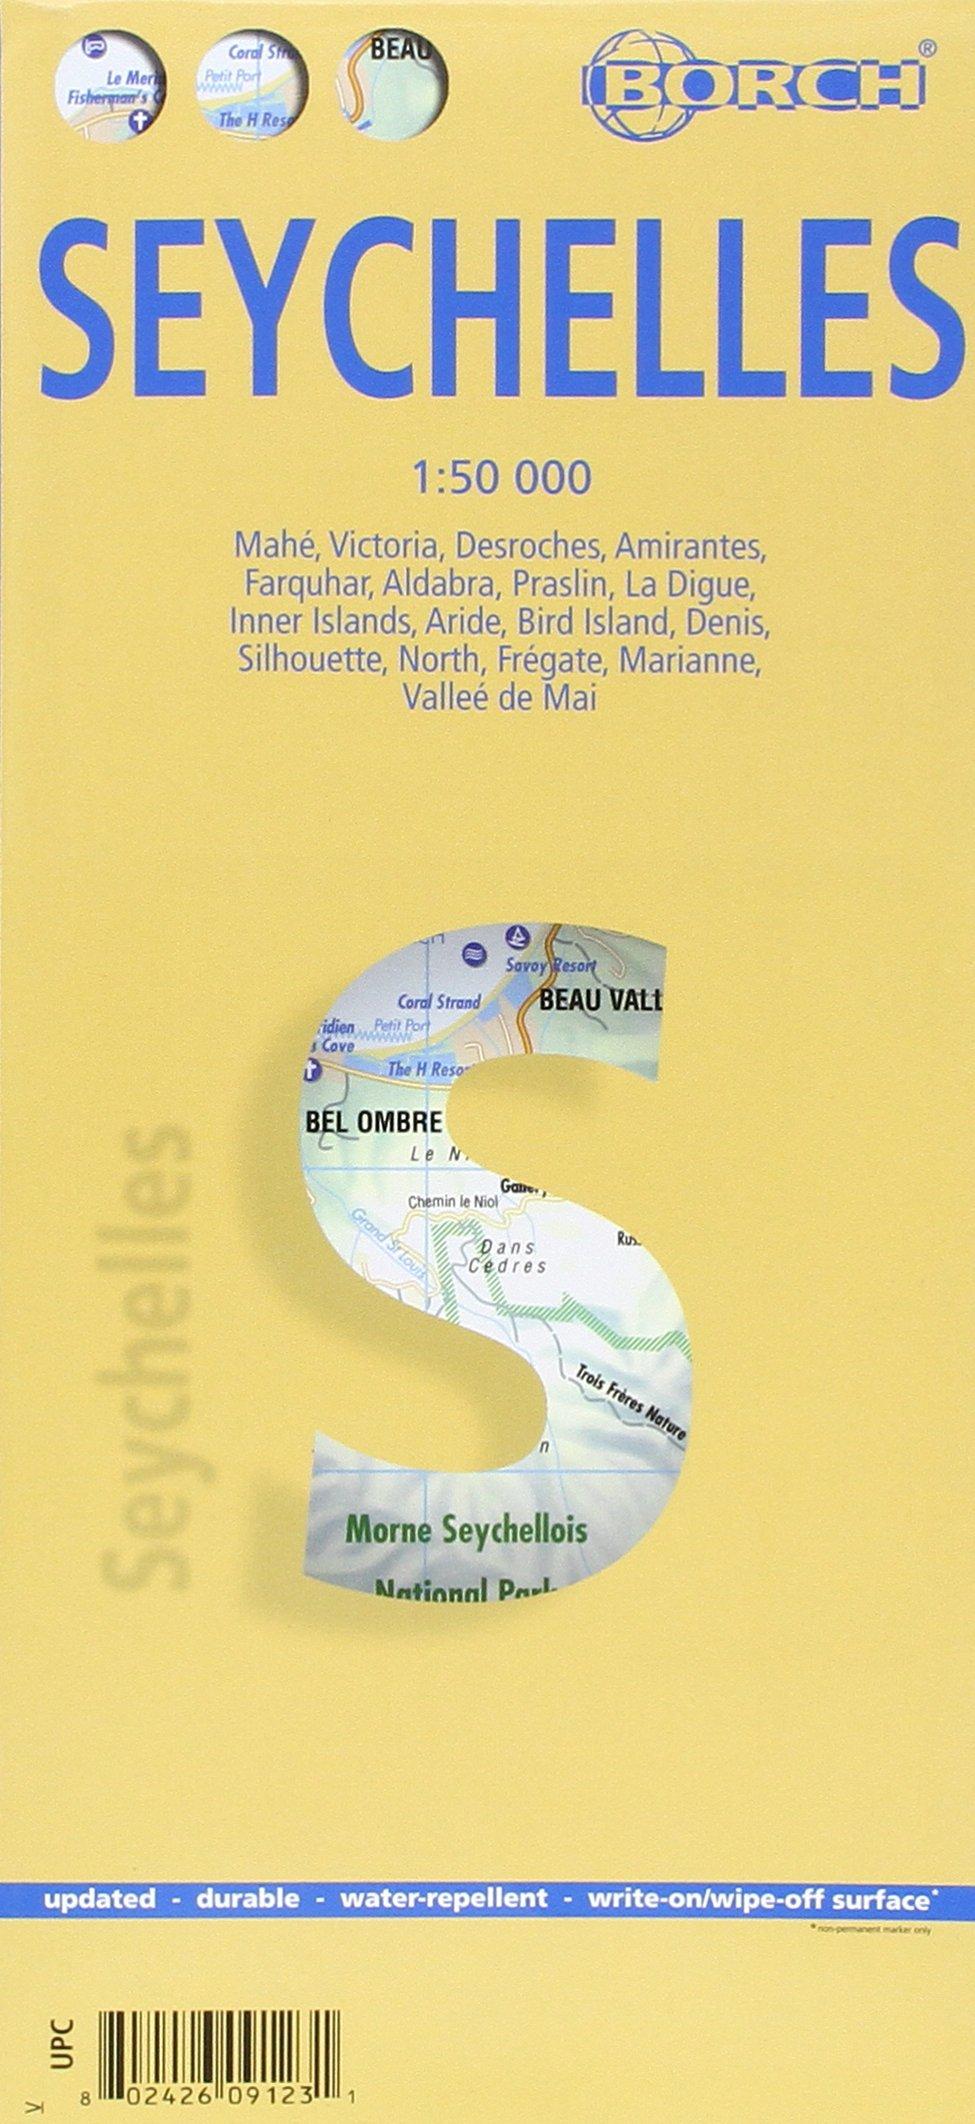 Seychellen: 1:50 000. Einzelkarten: Vaches, Denis, Arid, Fregate 1:25 000, Mahe, Silhouette, Praislin, La Digue, Marianne, Desroches, North 1:50 000, ... Amirantes, Farquhar 1:2 500 000 (Borch Maps)